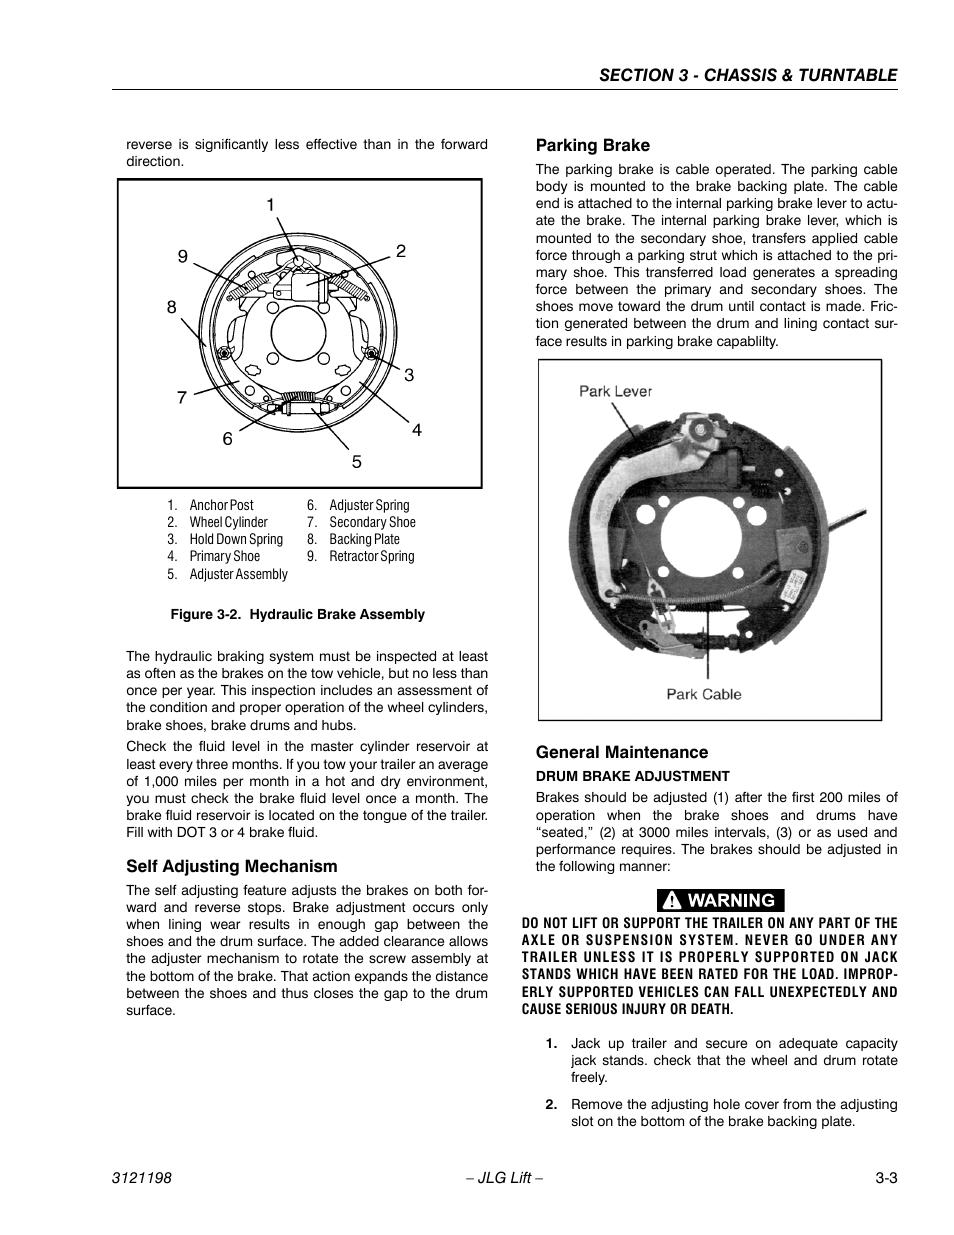 Self Adjusting Mechanism  Parking Brake  General